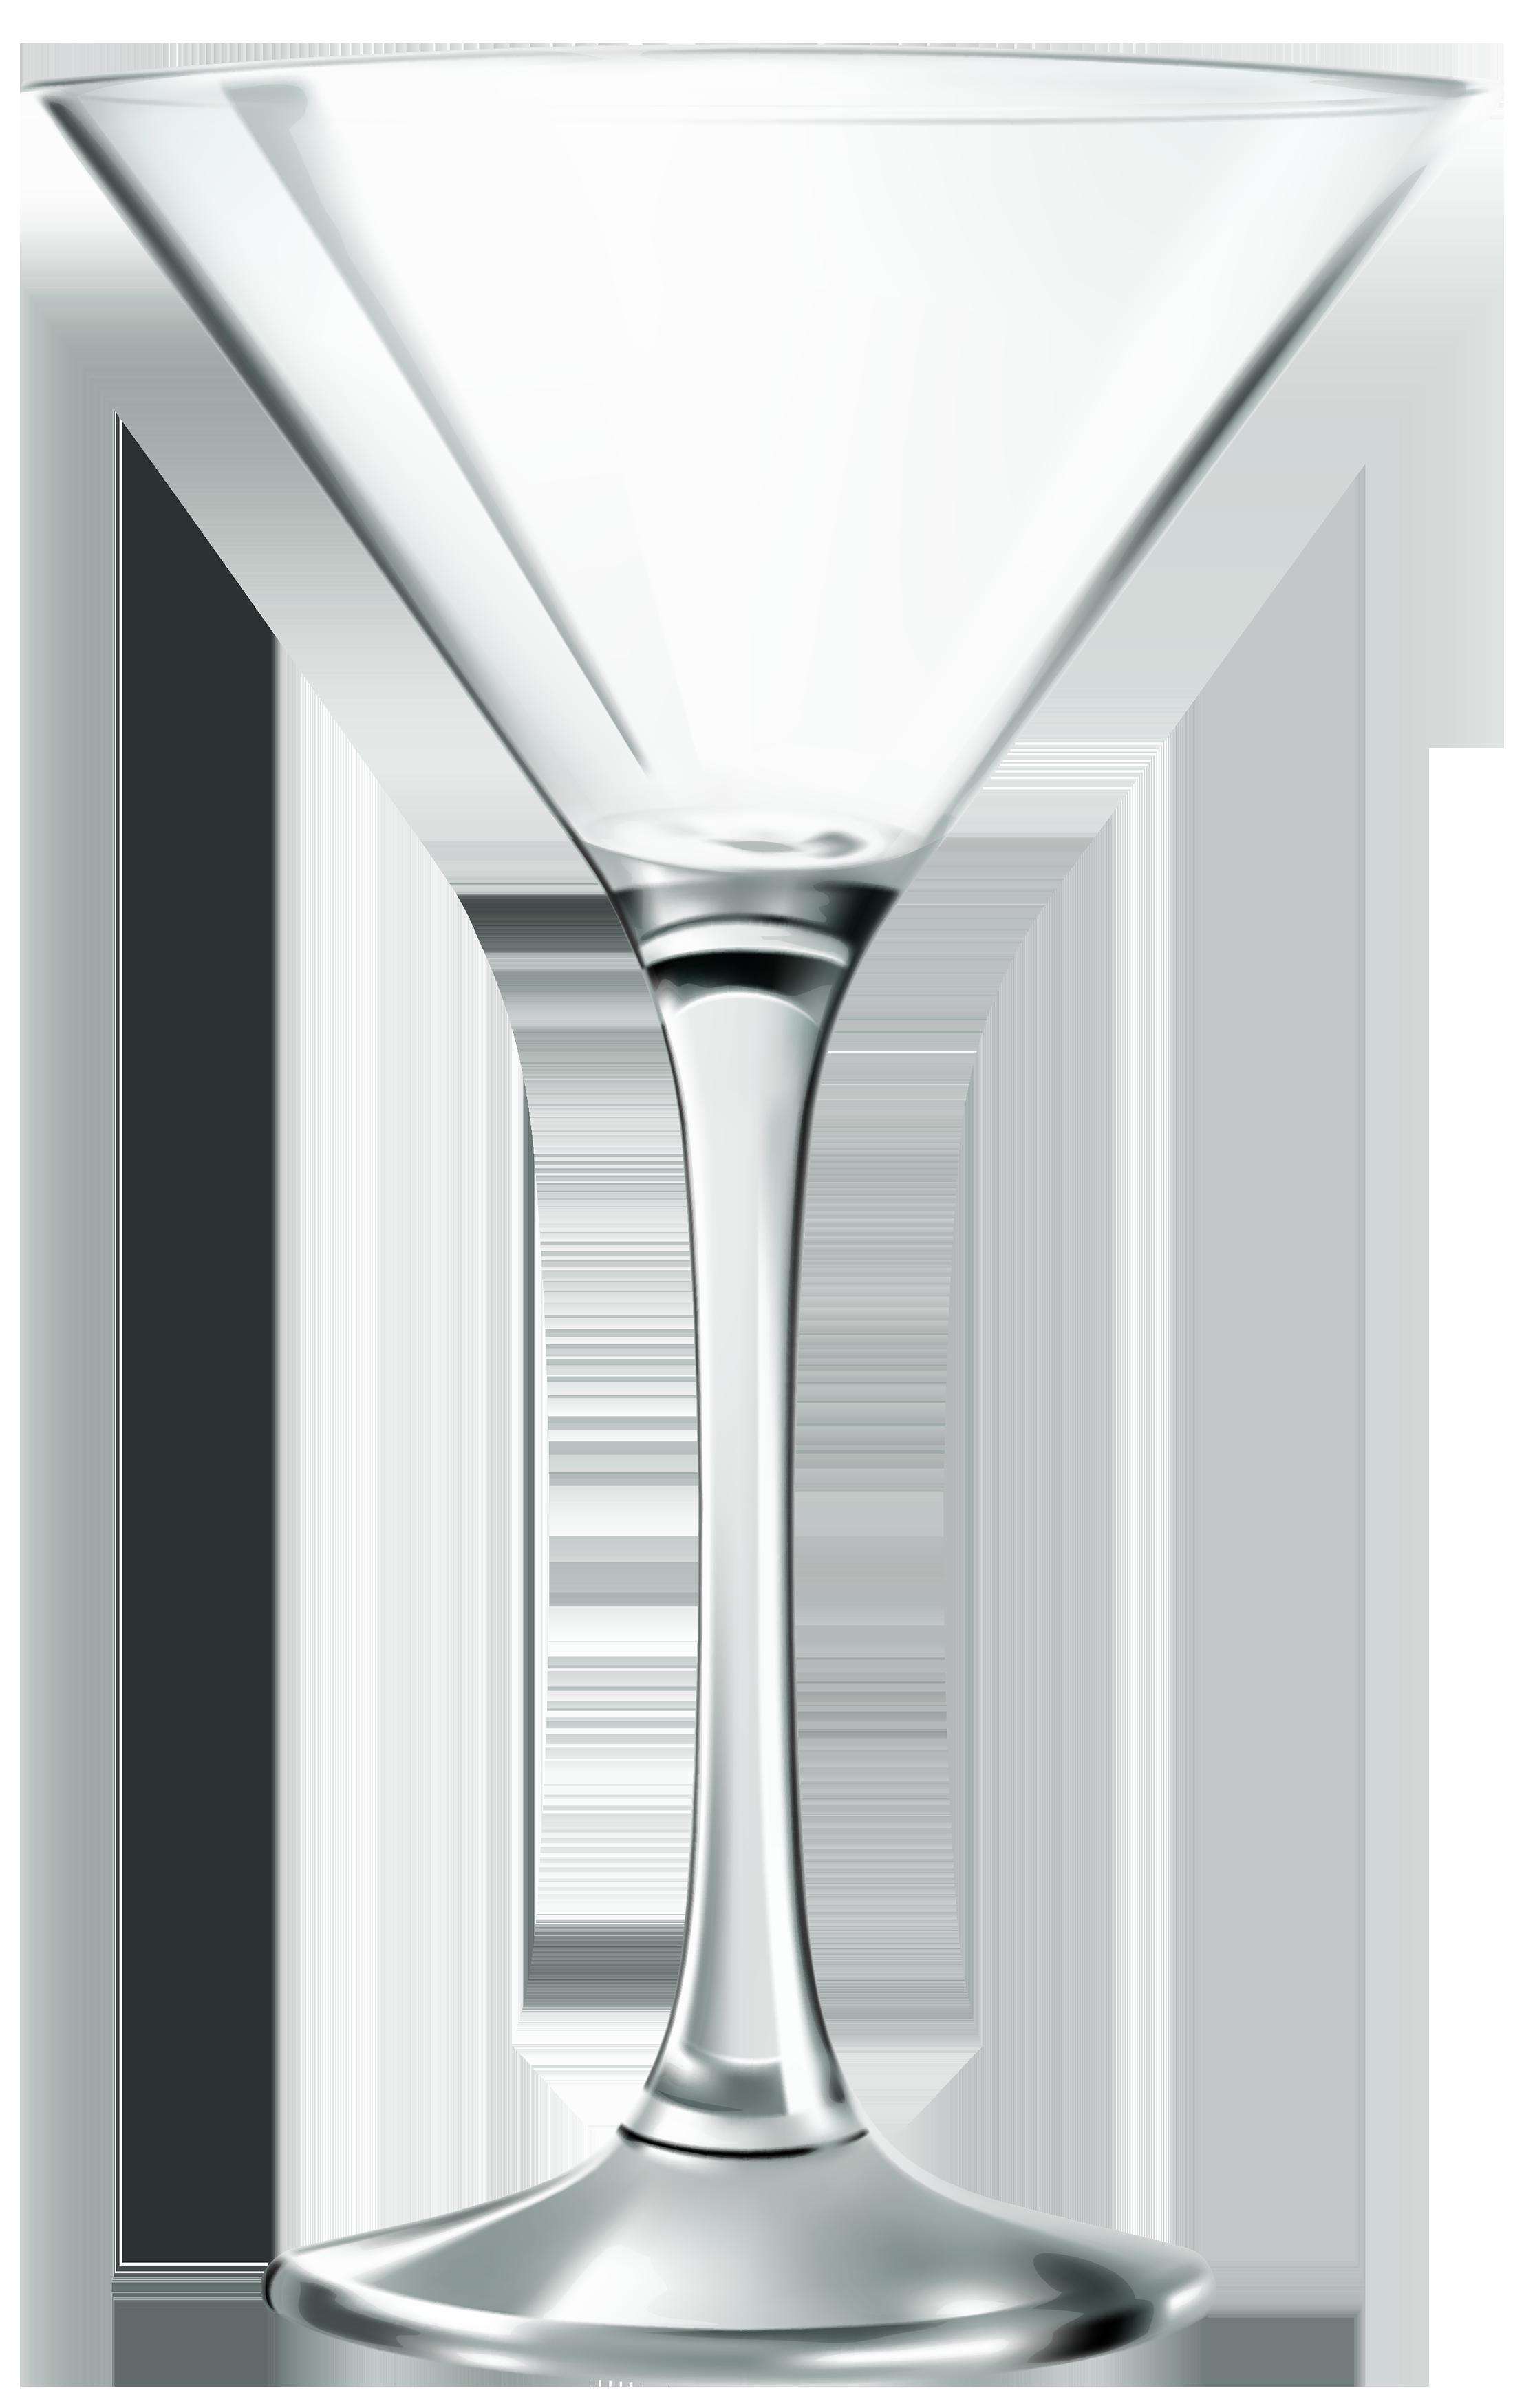 Cocktails clipart royalty free. Martini glass unusual idea